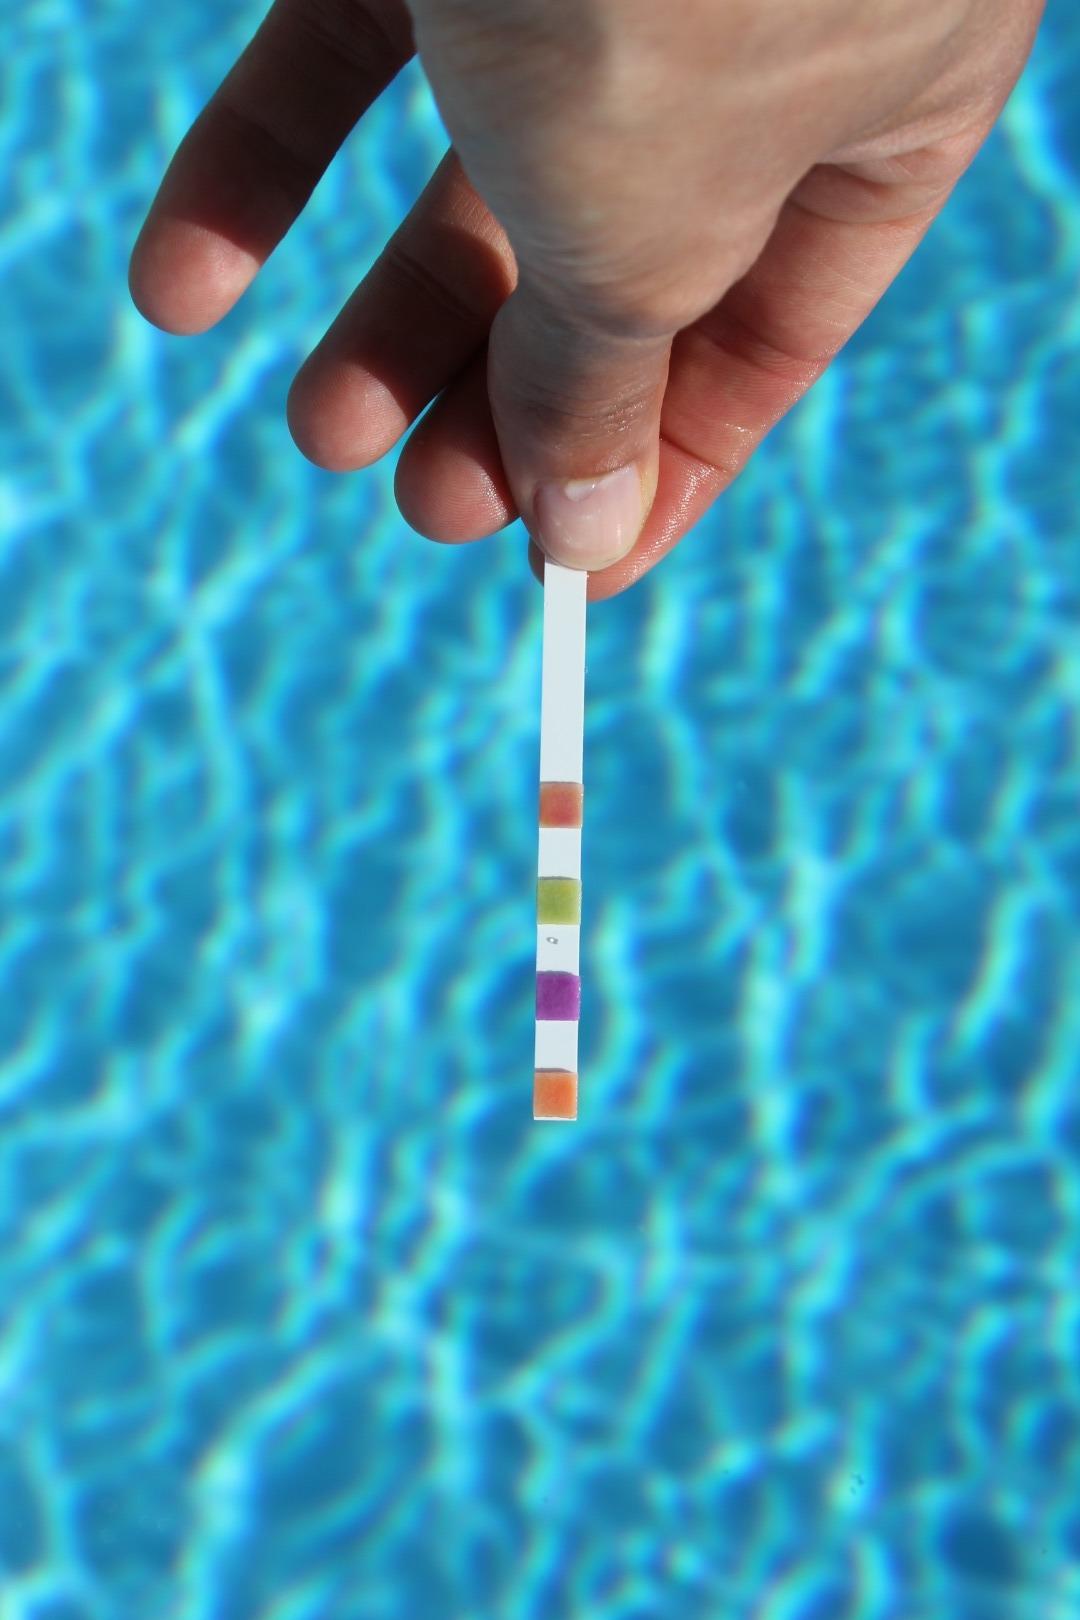 Entretien hebdomadaire d'une piscine